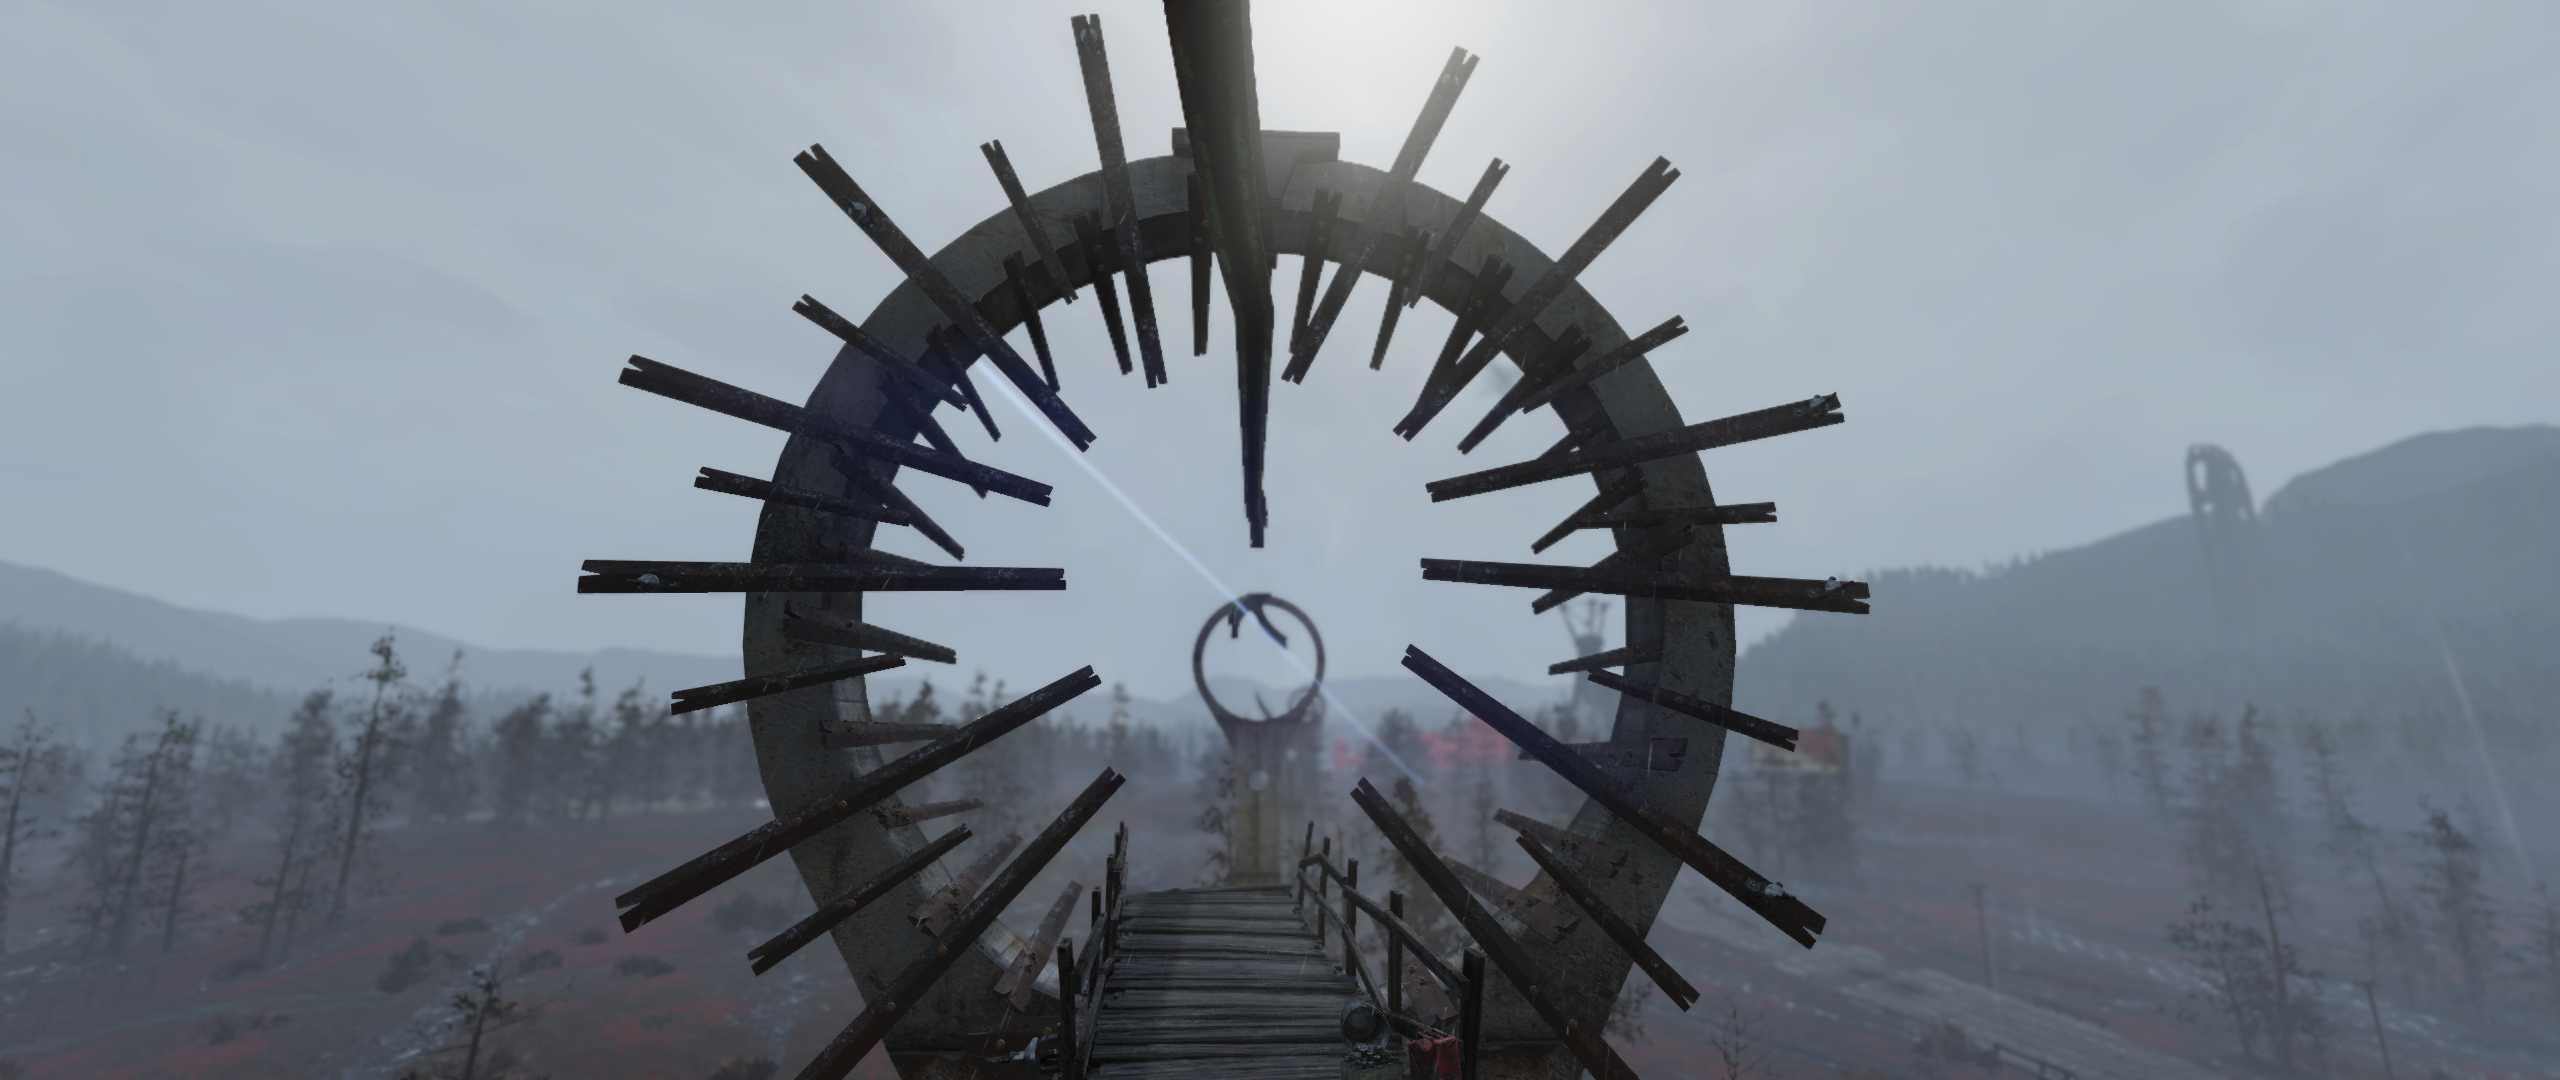 Fallout 76 Pylon V-13 Teslabogen